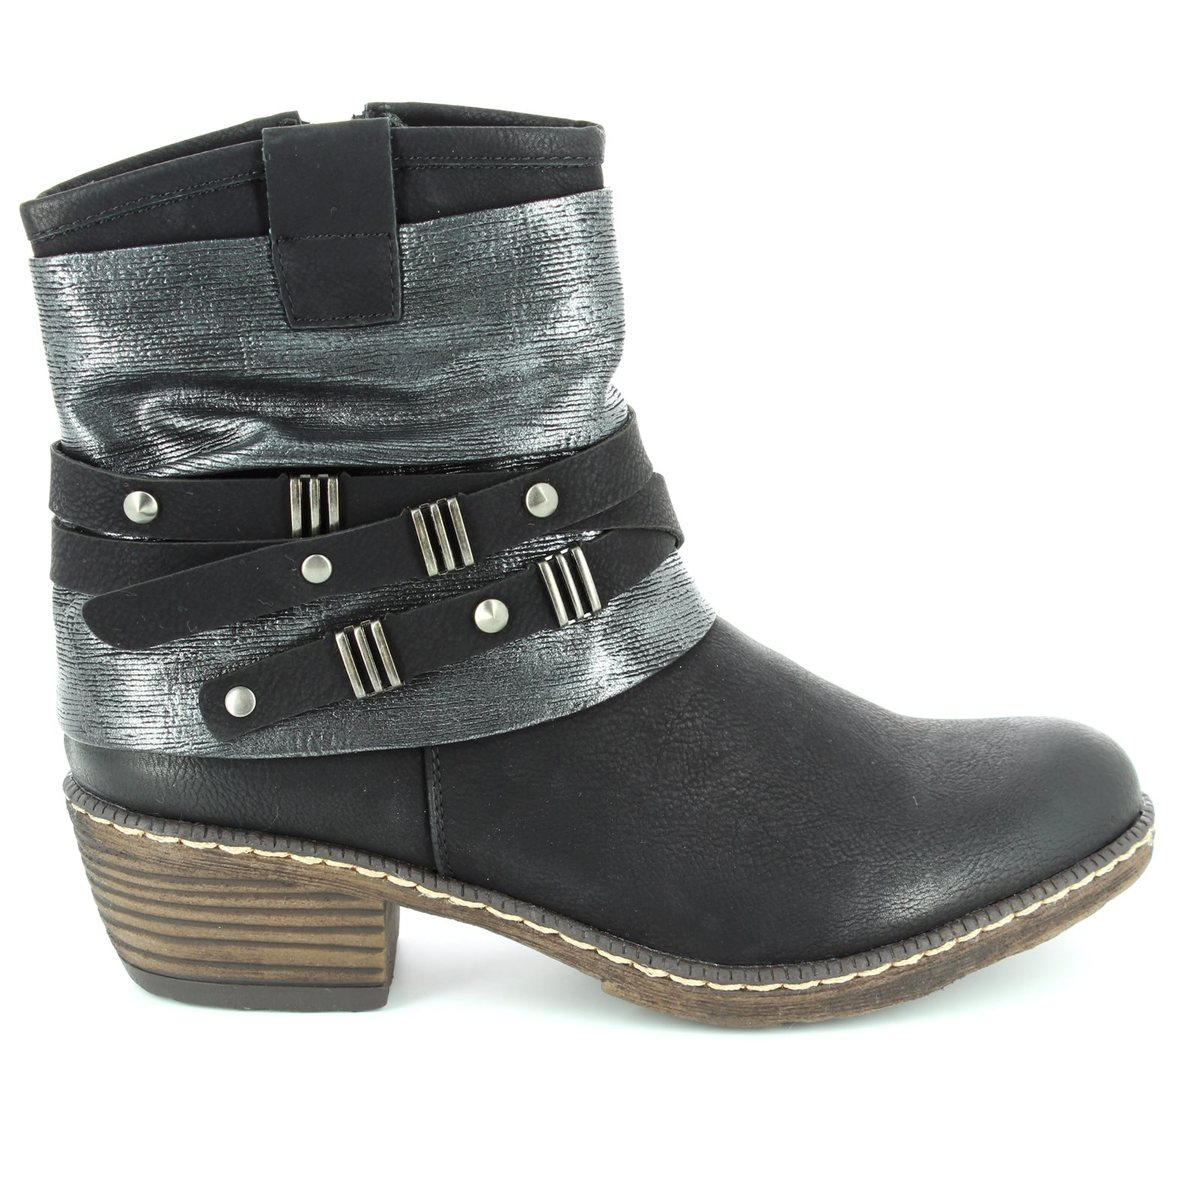 e7ff4b4a8f0ab Rieker Boots - Black - K1483-01 BERNASTRA